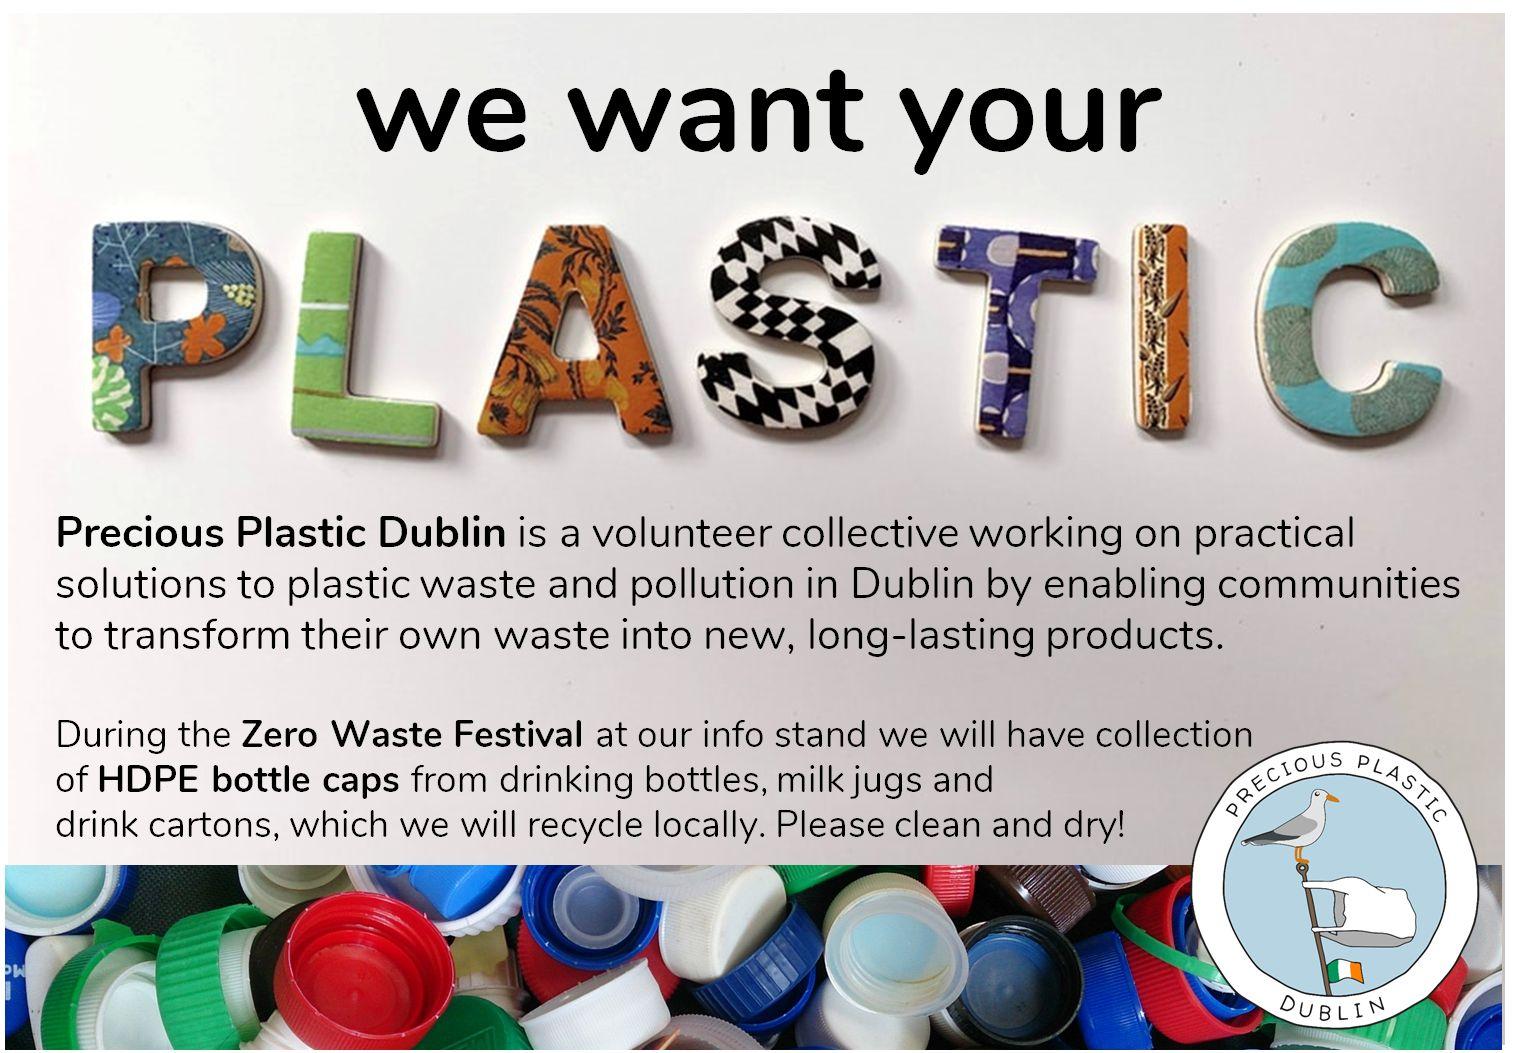 Precious Plastic Dublin at the Zero Waste Festival at the Science Gallery